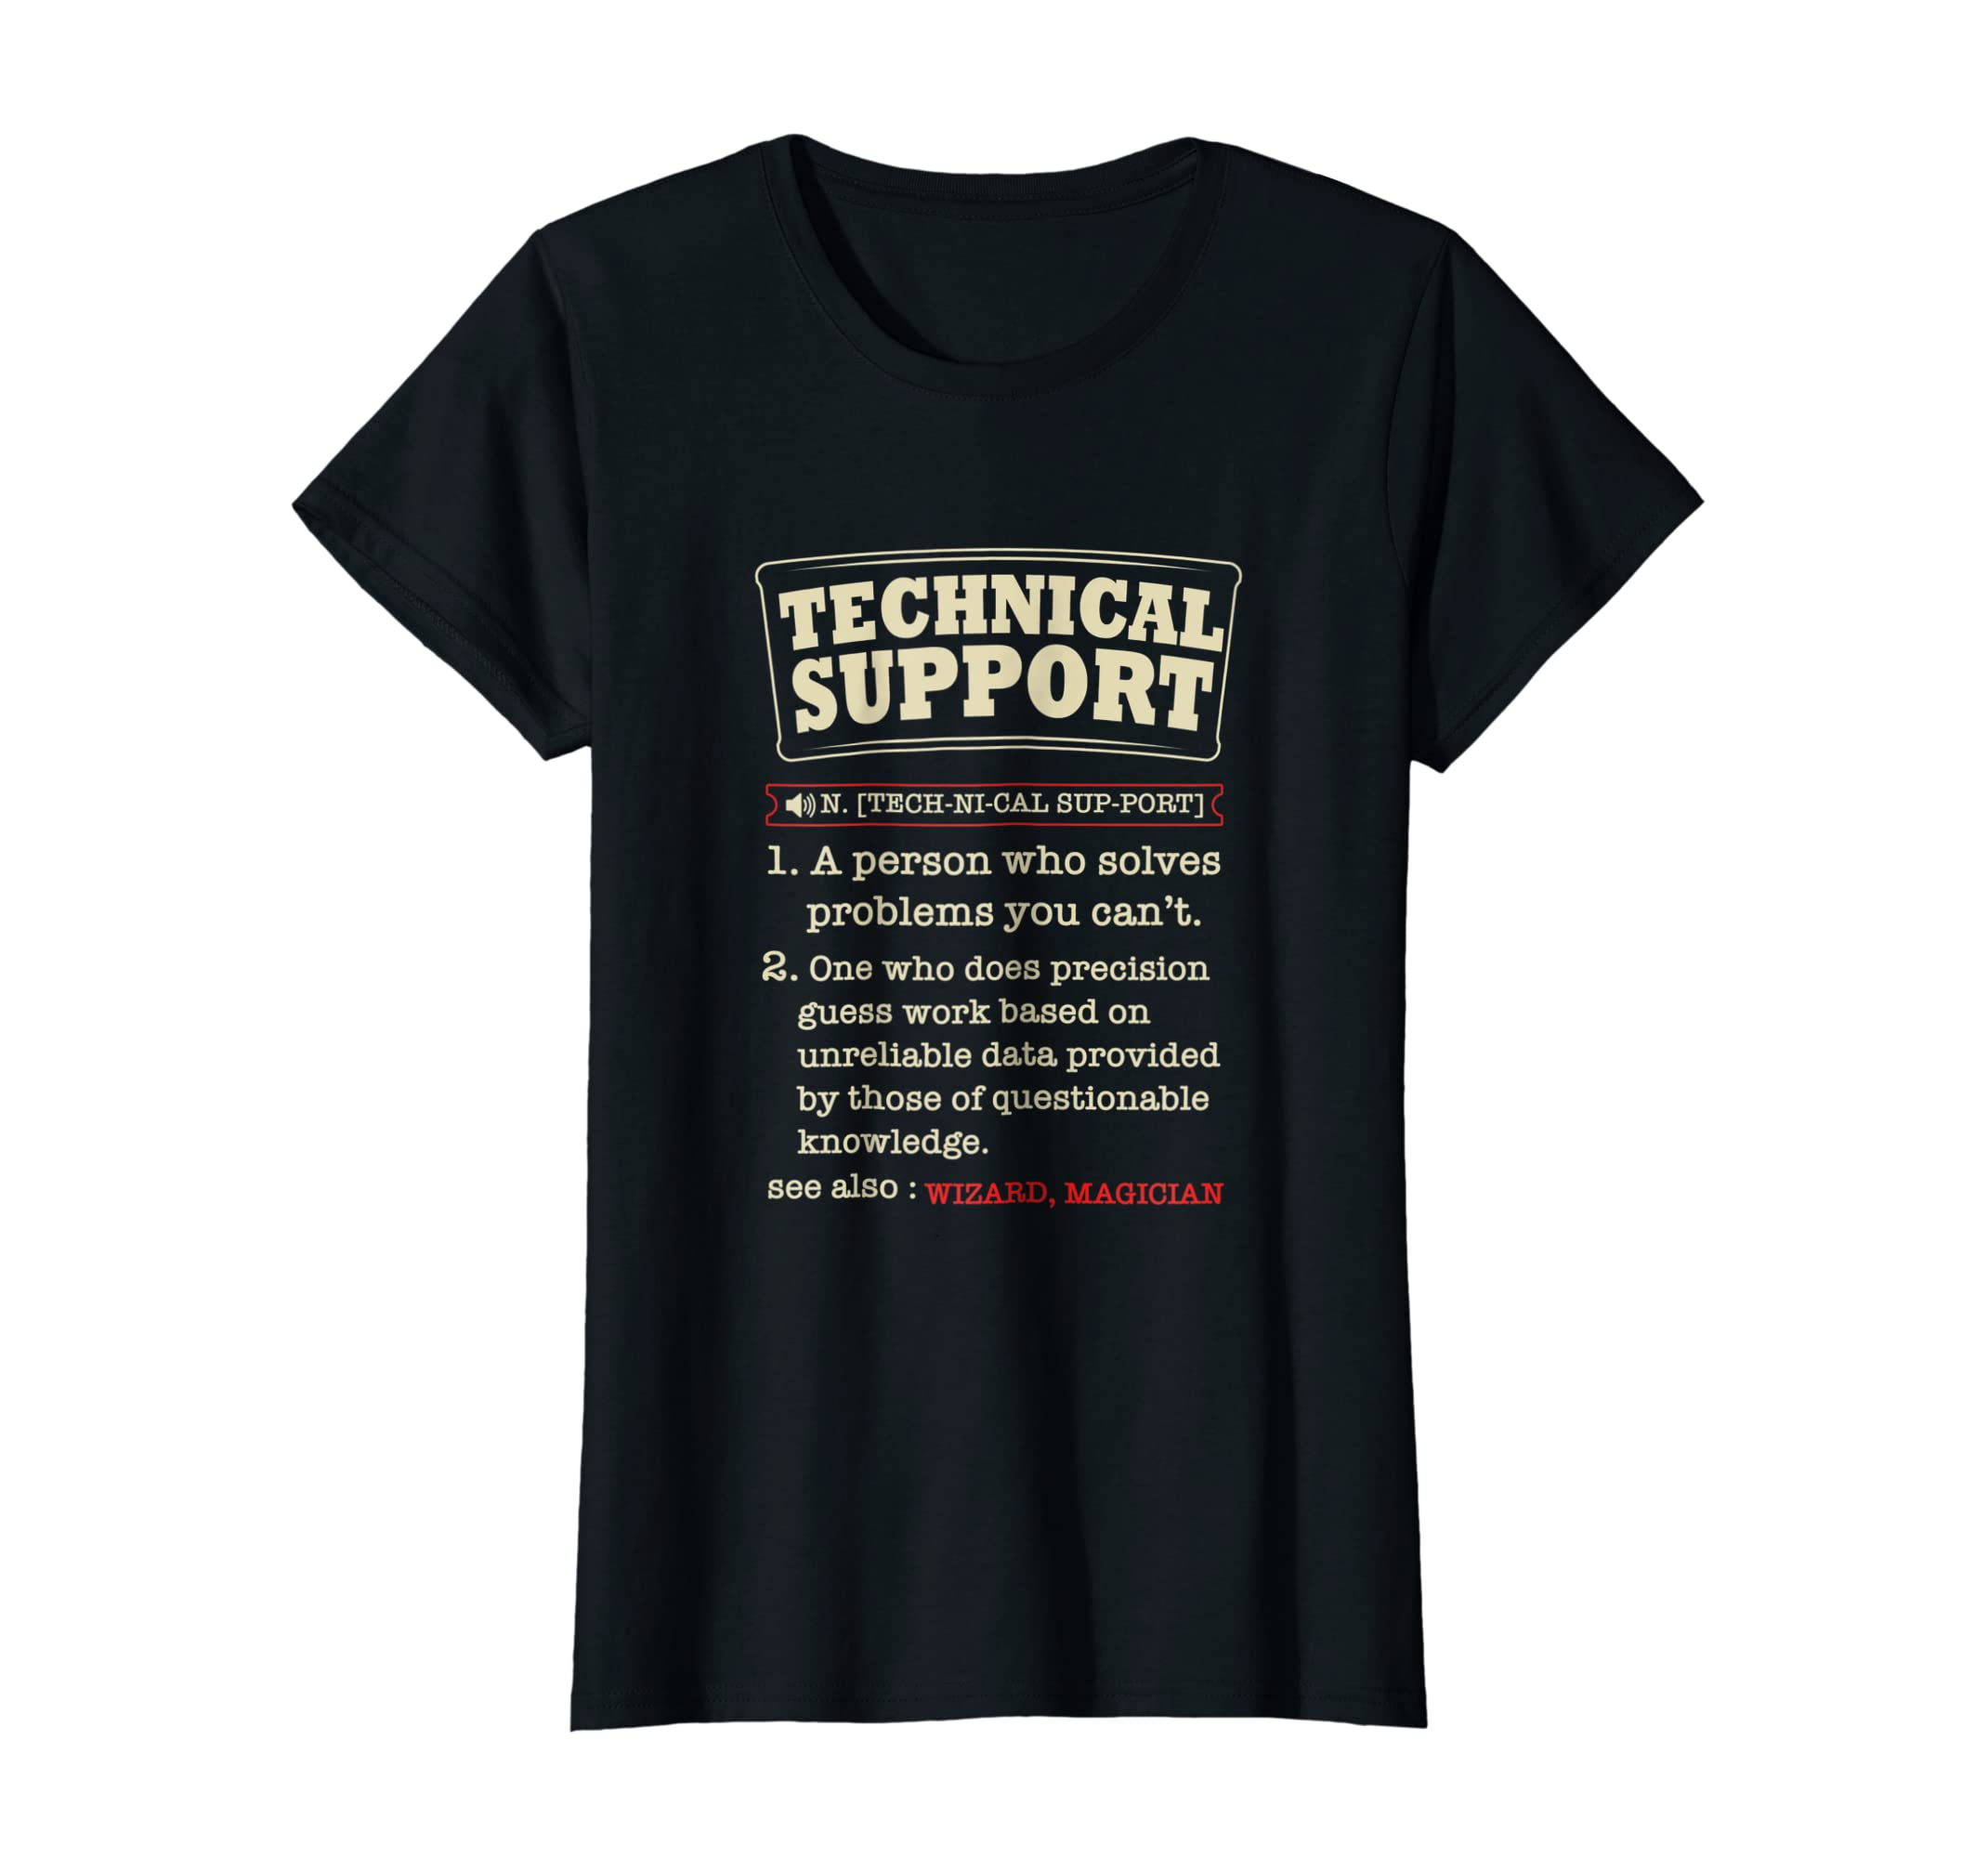 ce1f547580e5 Amazon.com: Tech Support Definition Shirt-Funny Computer Nerd Gift Shirt:  Clothing